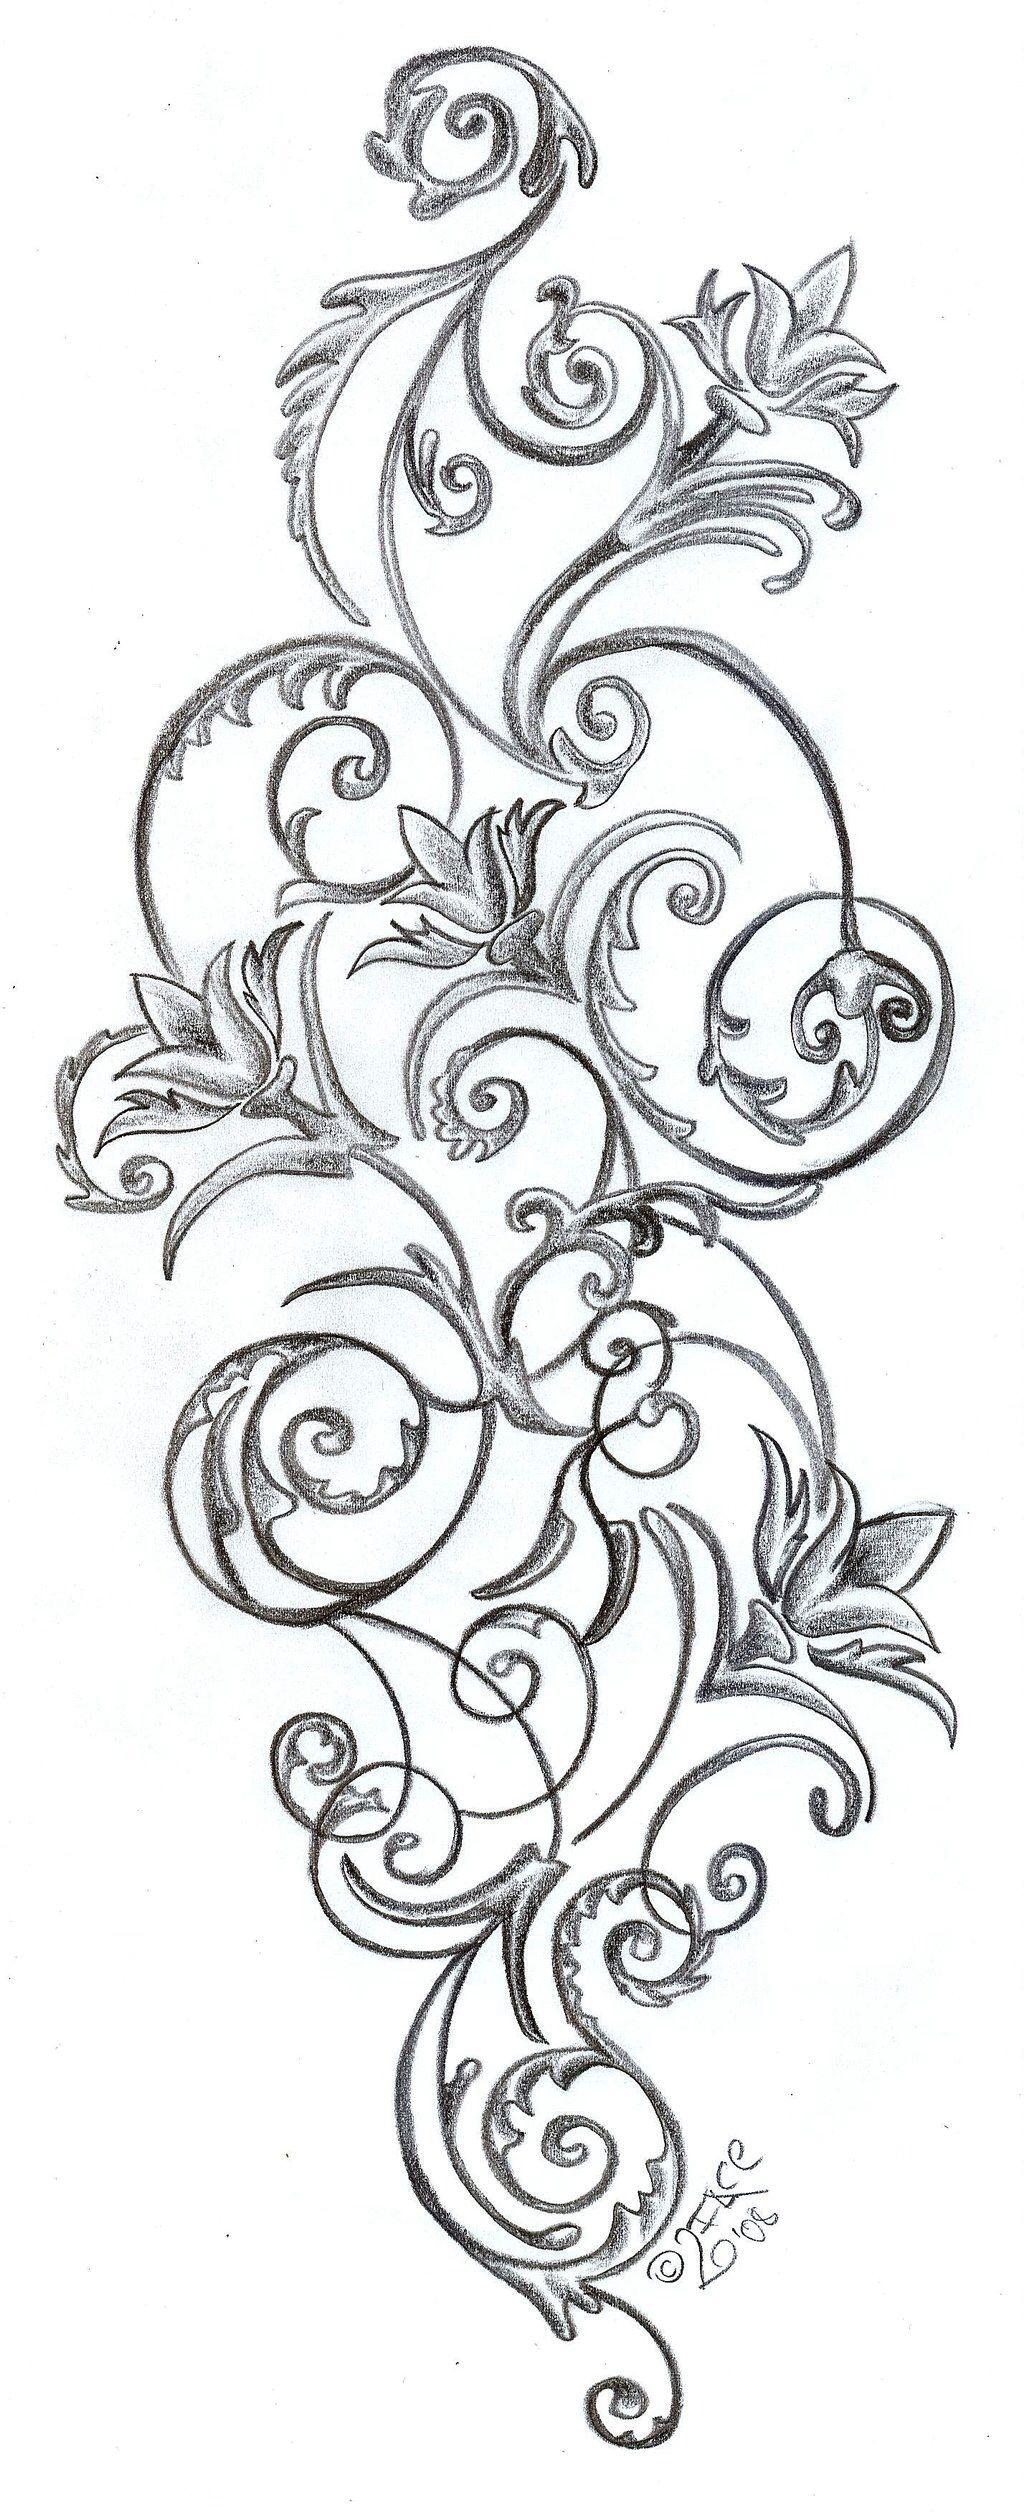 Tattoo idea | tattoos | Pinterest | Tatuajes, Bordado y Inspiración ...